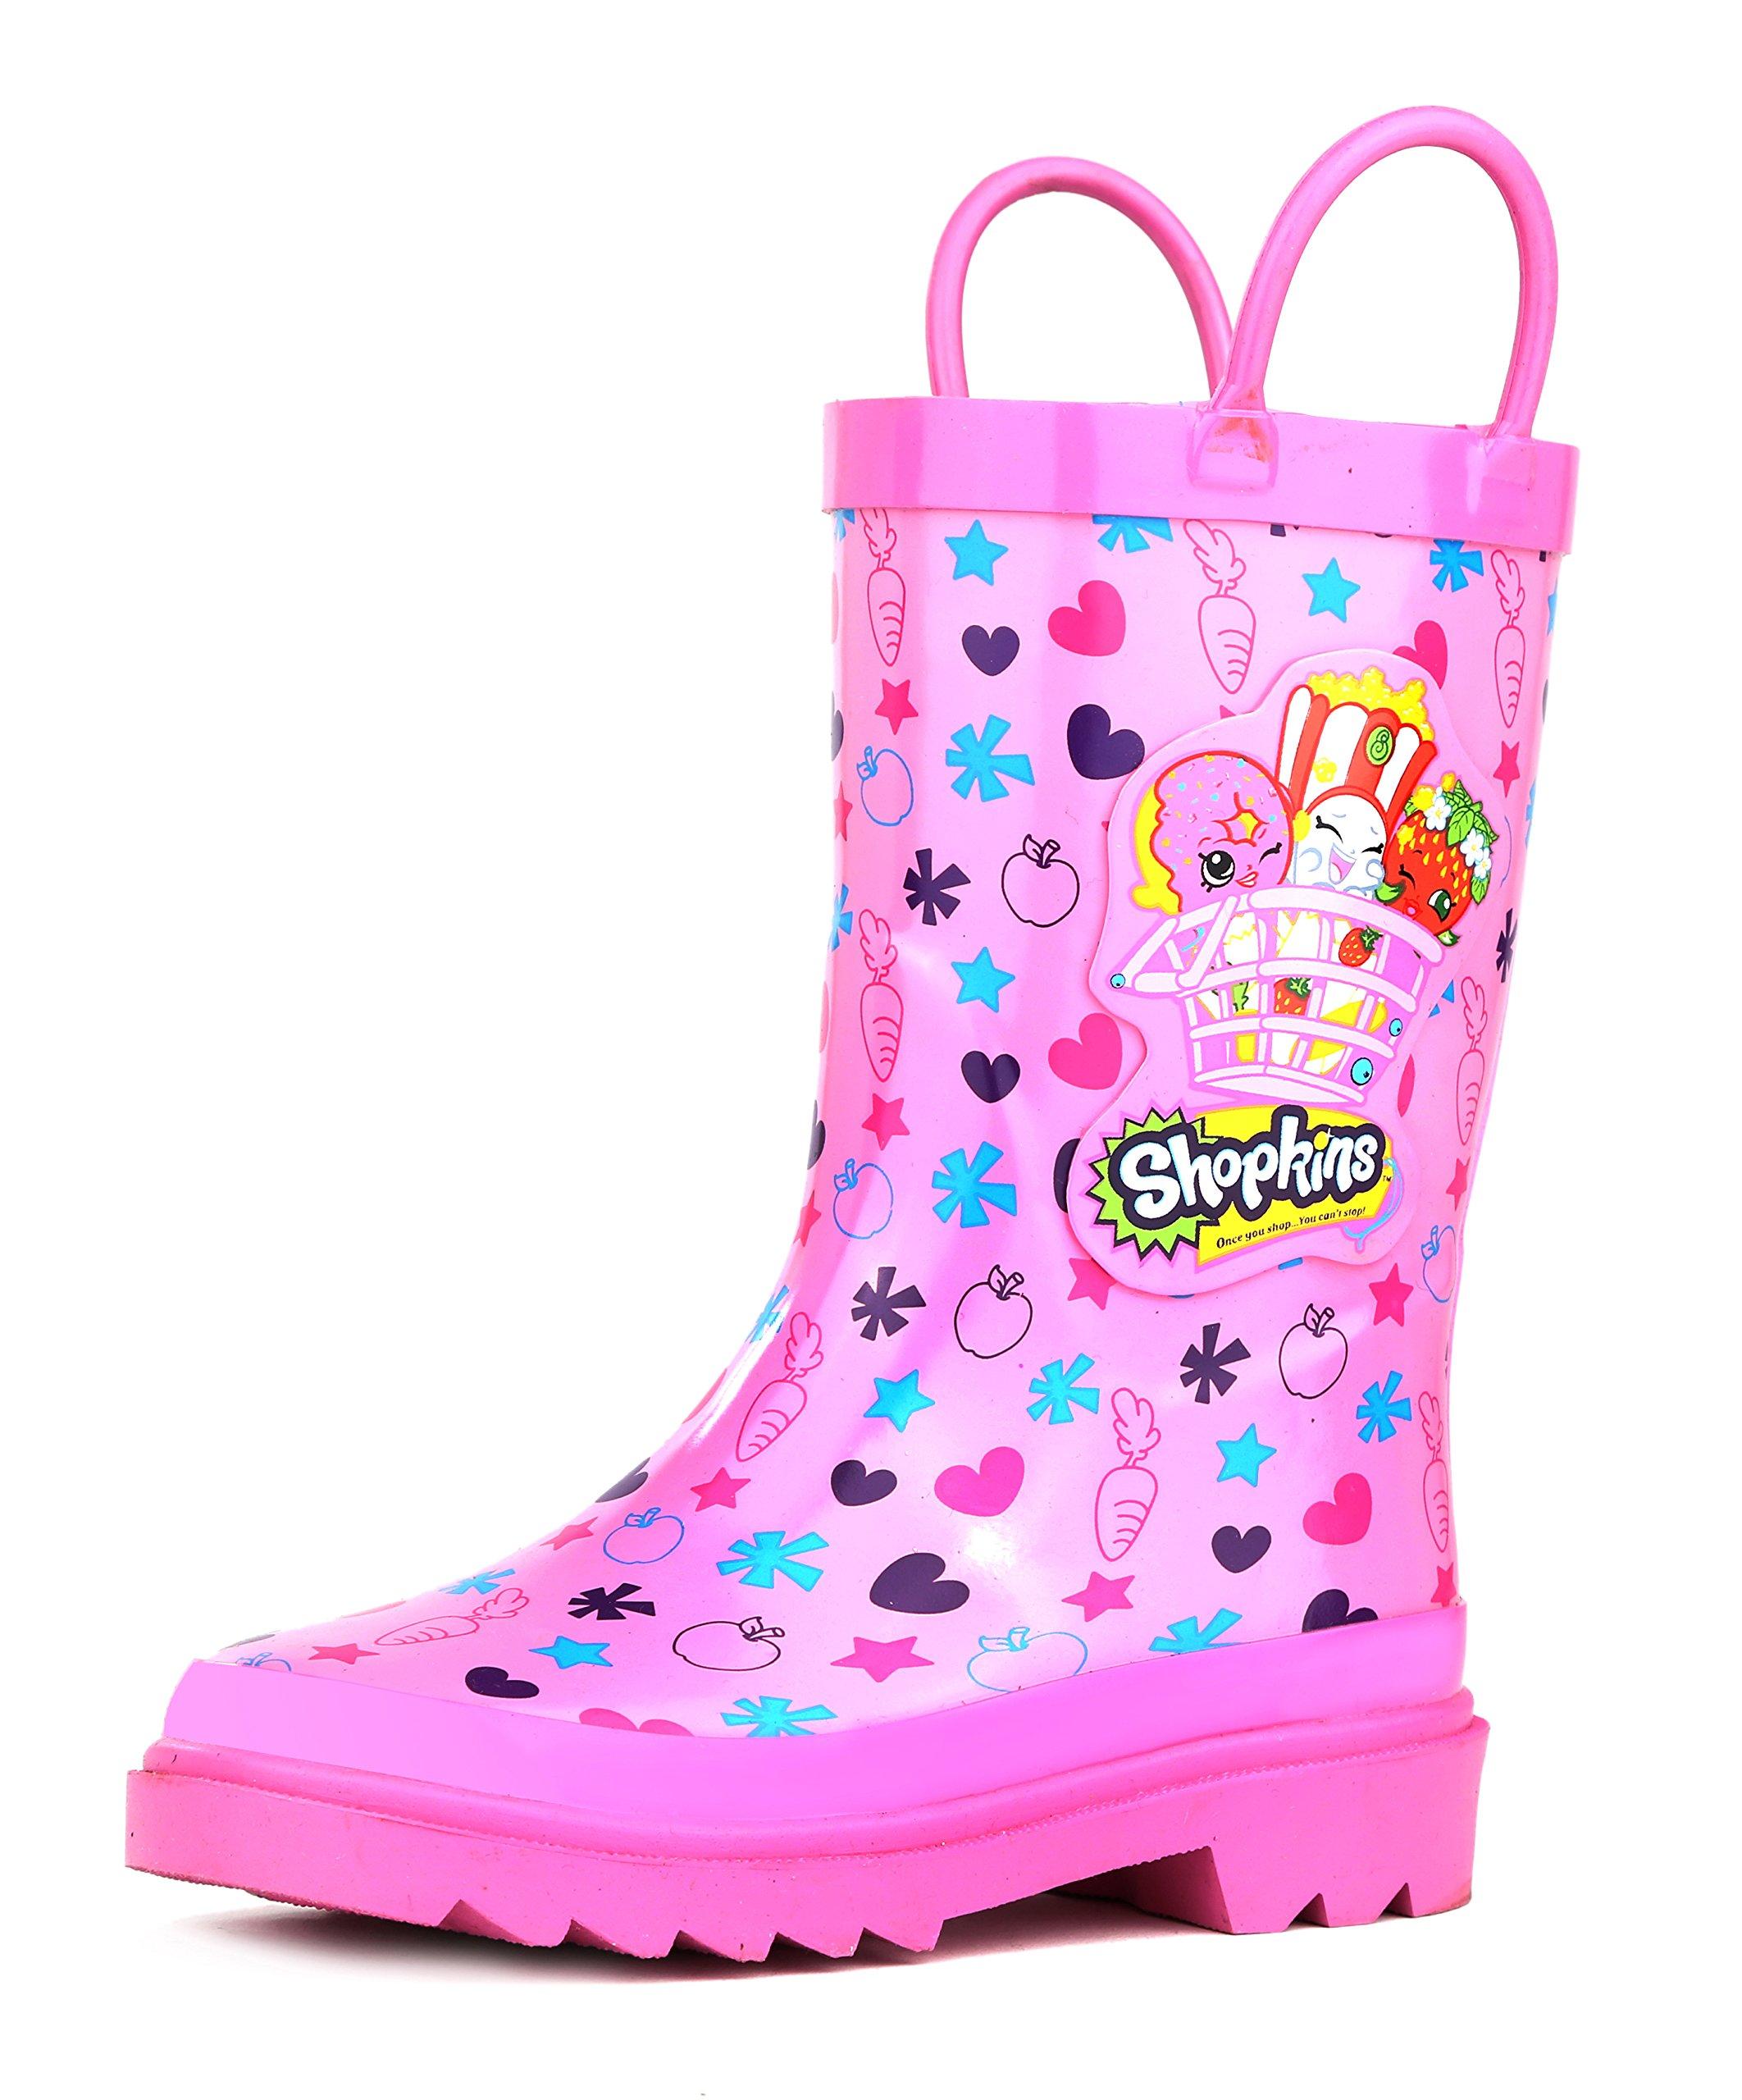 Shopkins Girl's Pink Rain Boots - Size 11 Little Kid